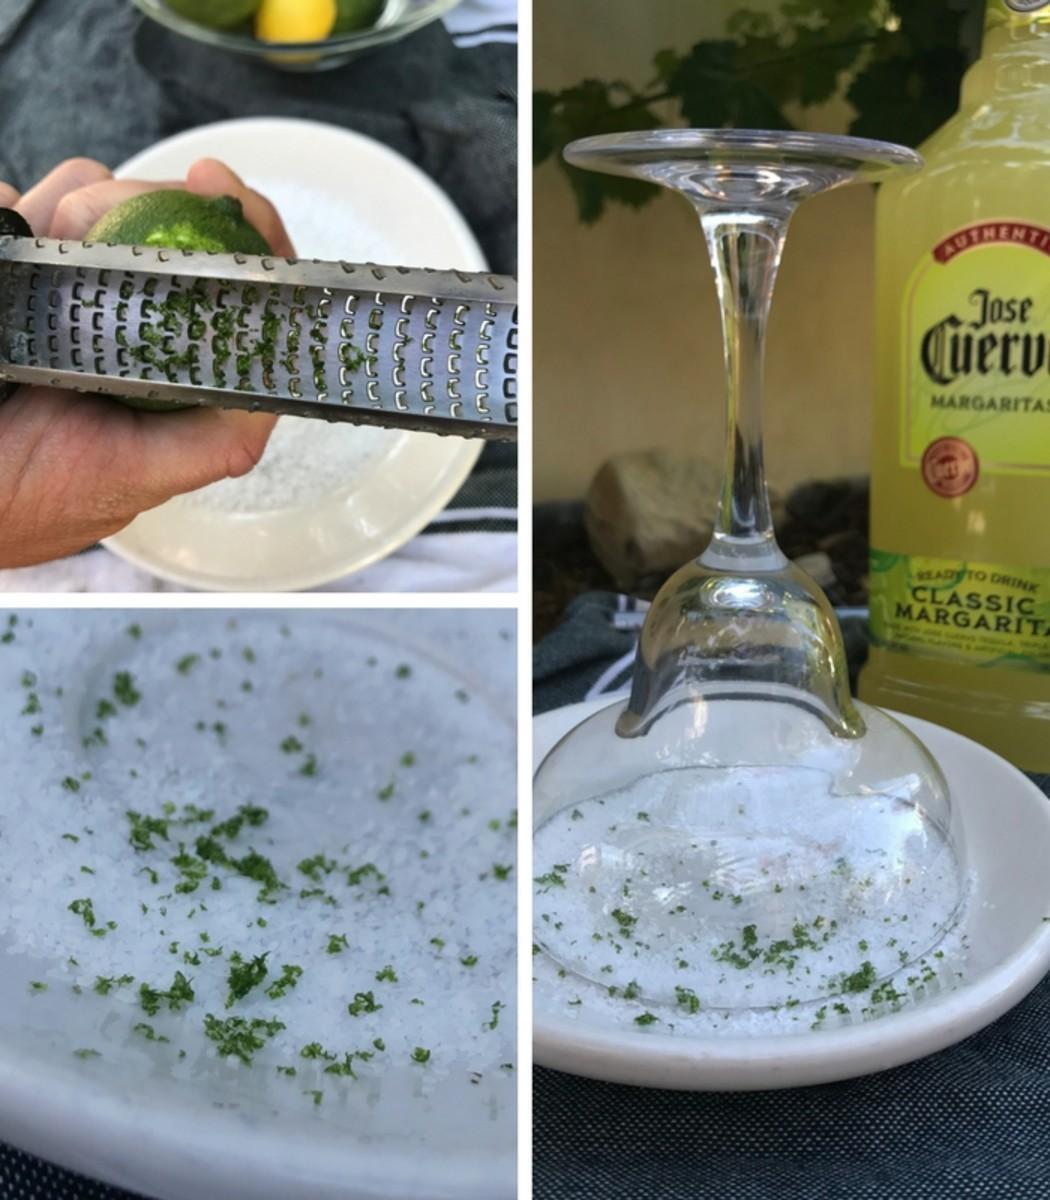 Margarita lime salt